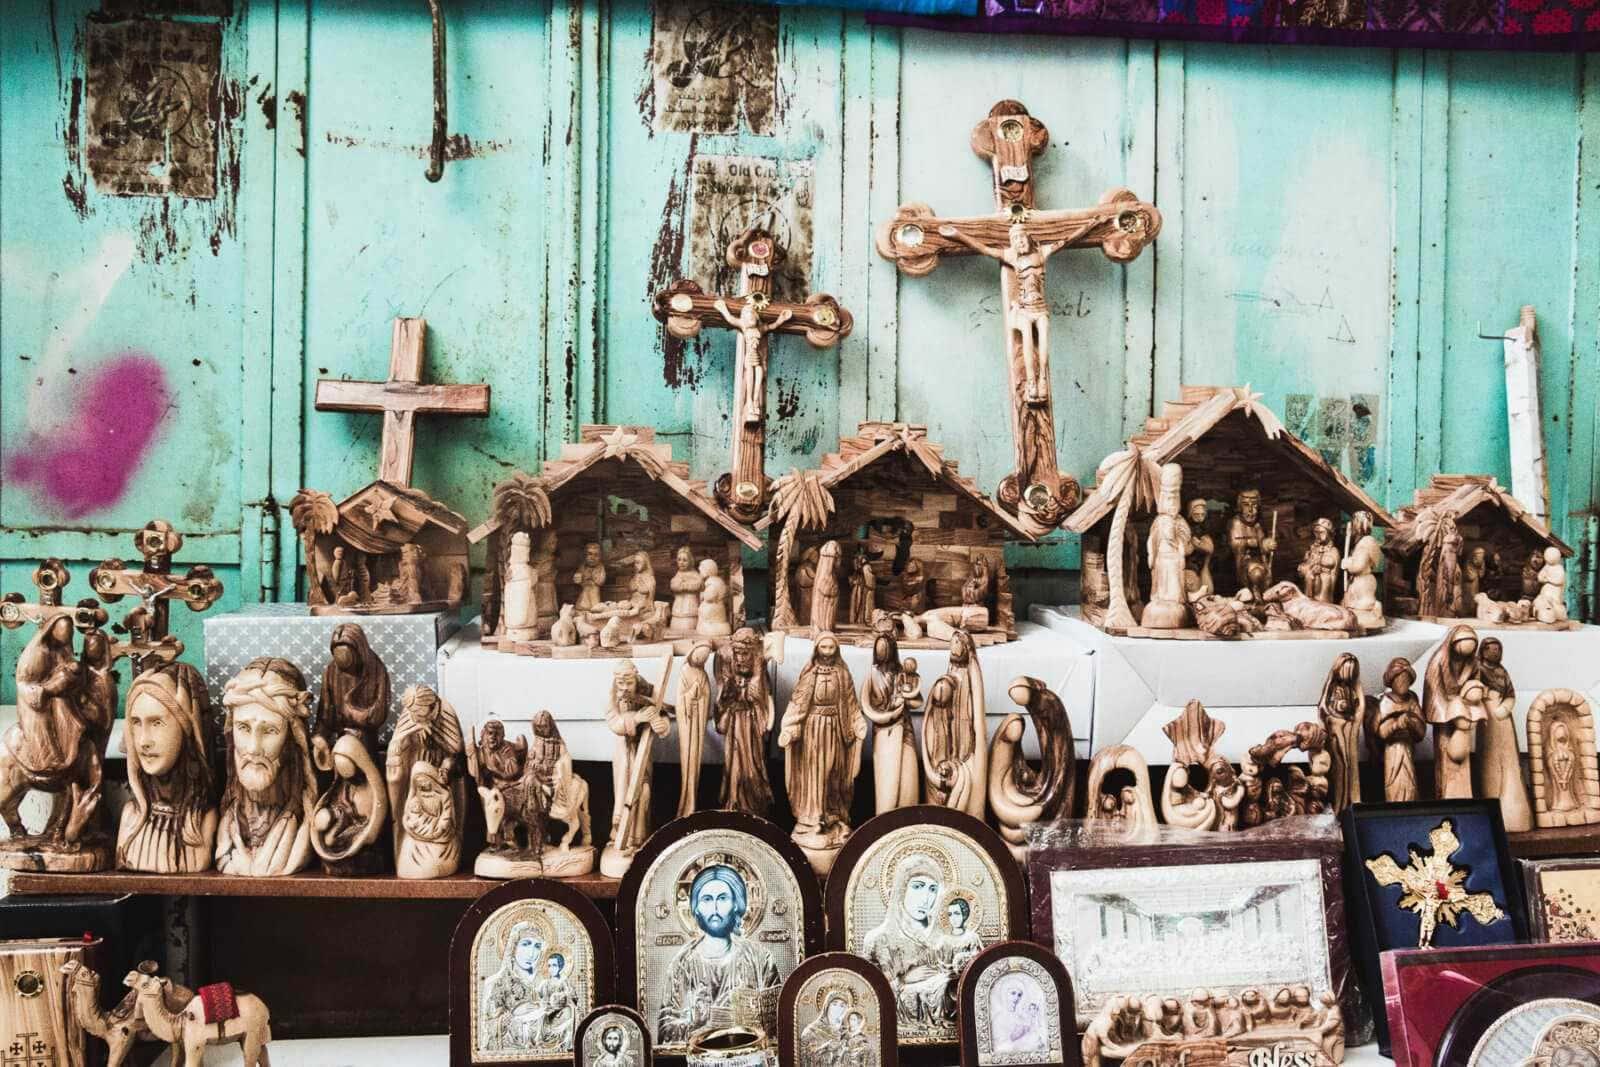 kruzifixe krippen und heiligenbilder